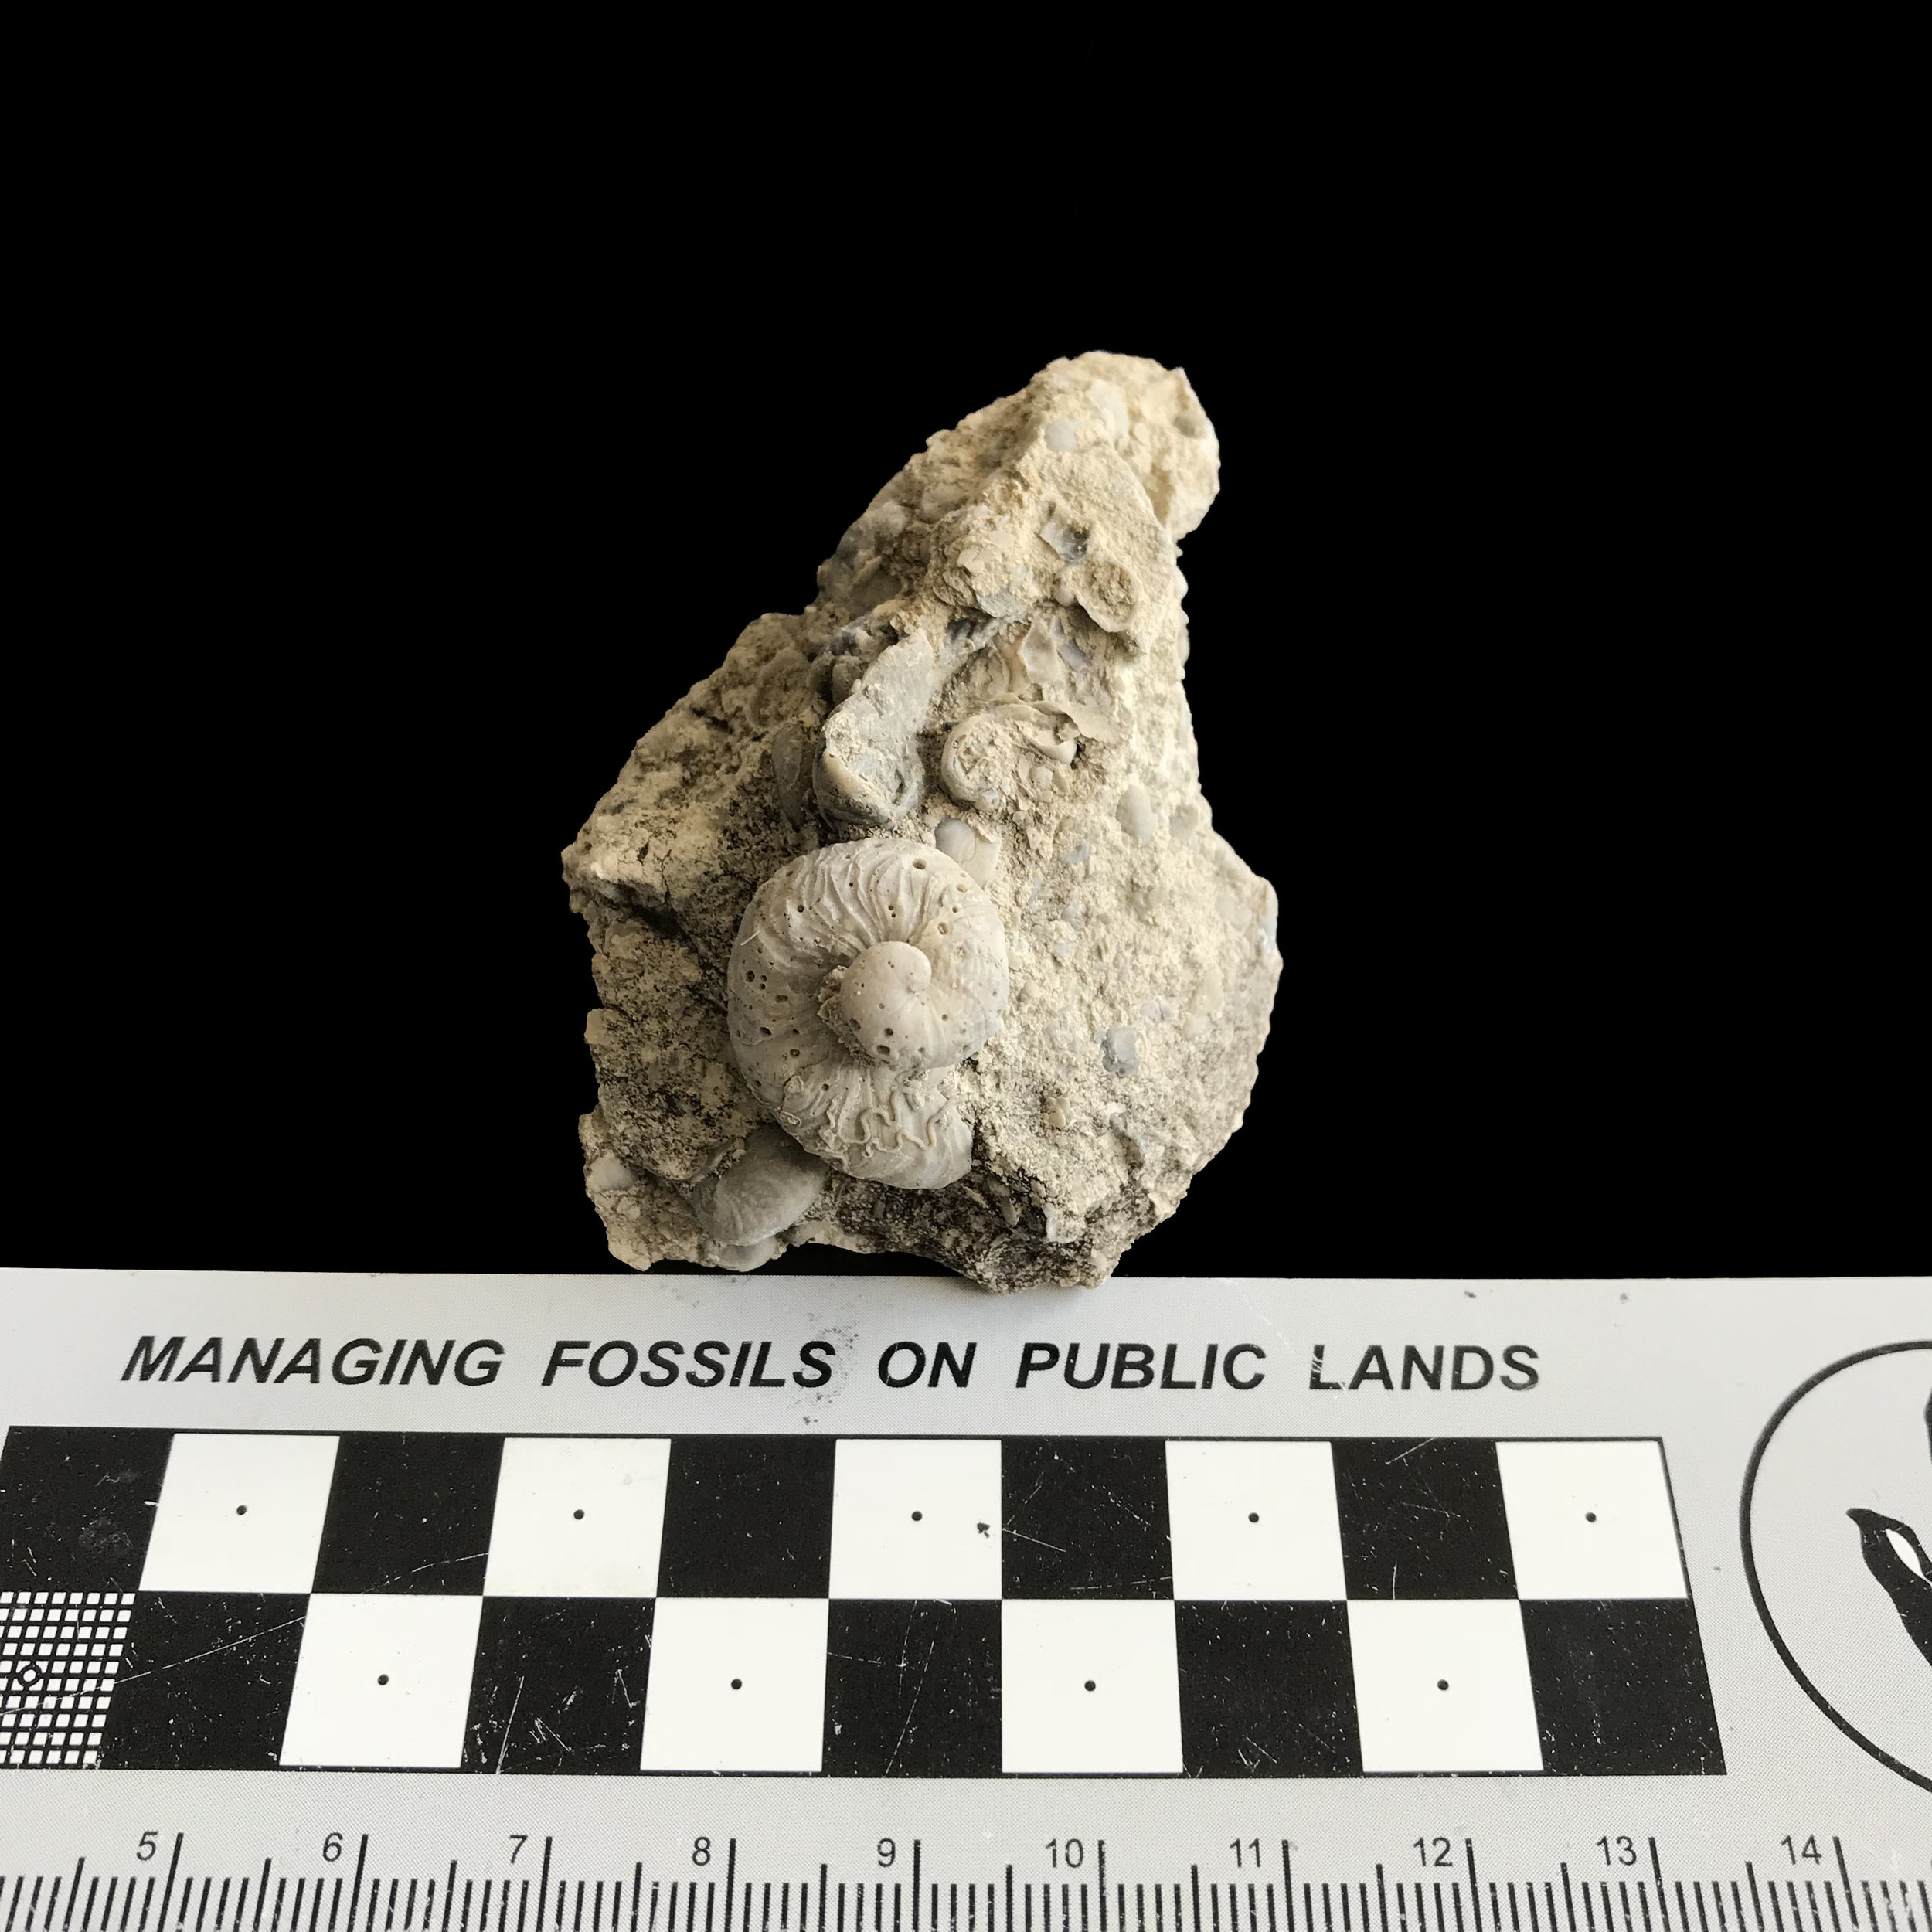 Ilymatogyra arietina #1130  Grayson Marl Formation  Denton Co., TX